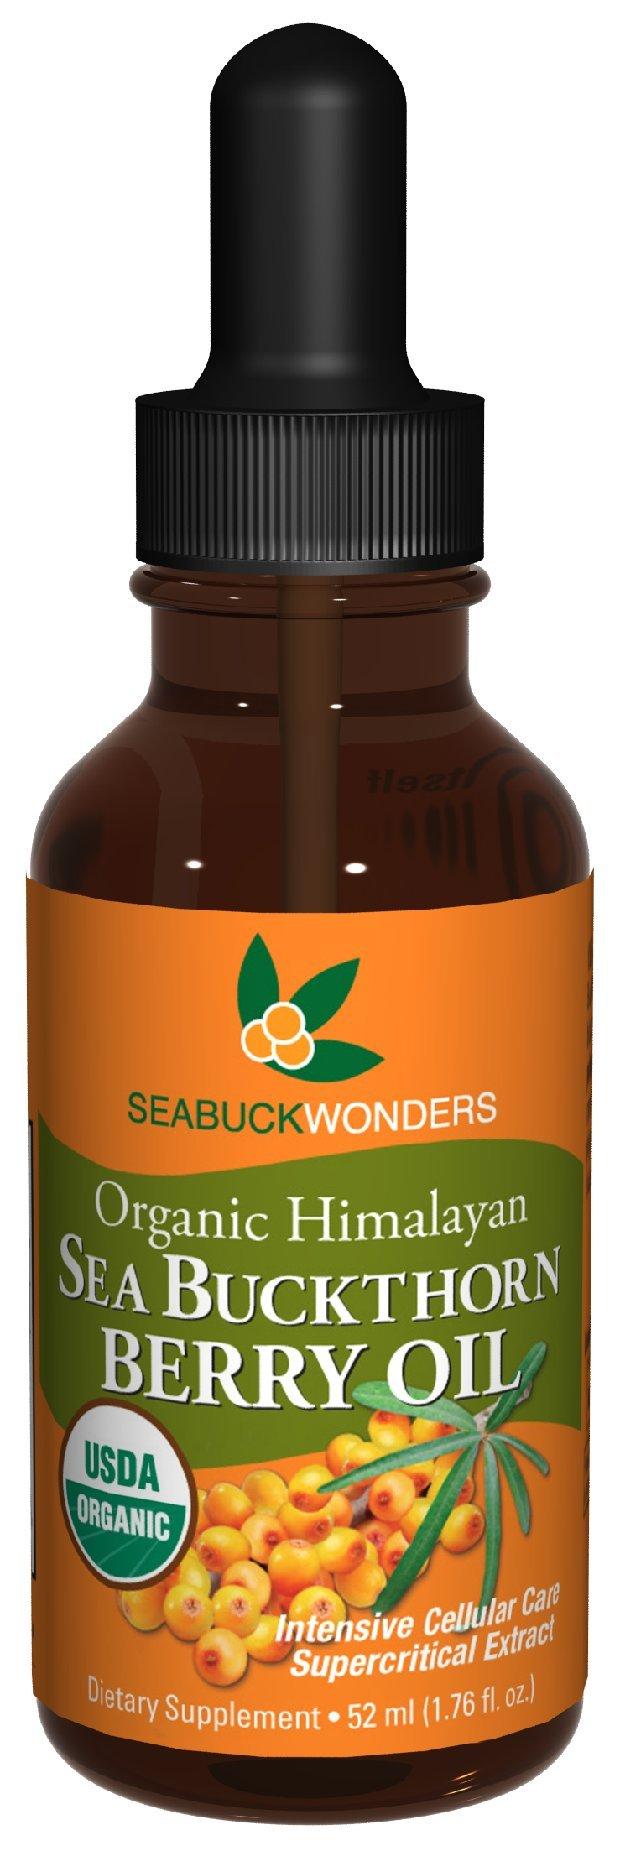 Sea Buckthorn Berry Oil - 100% Certified Organic, 1.76-Ounces Bottle (Pack of 12)